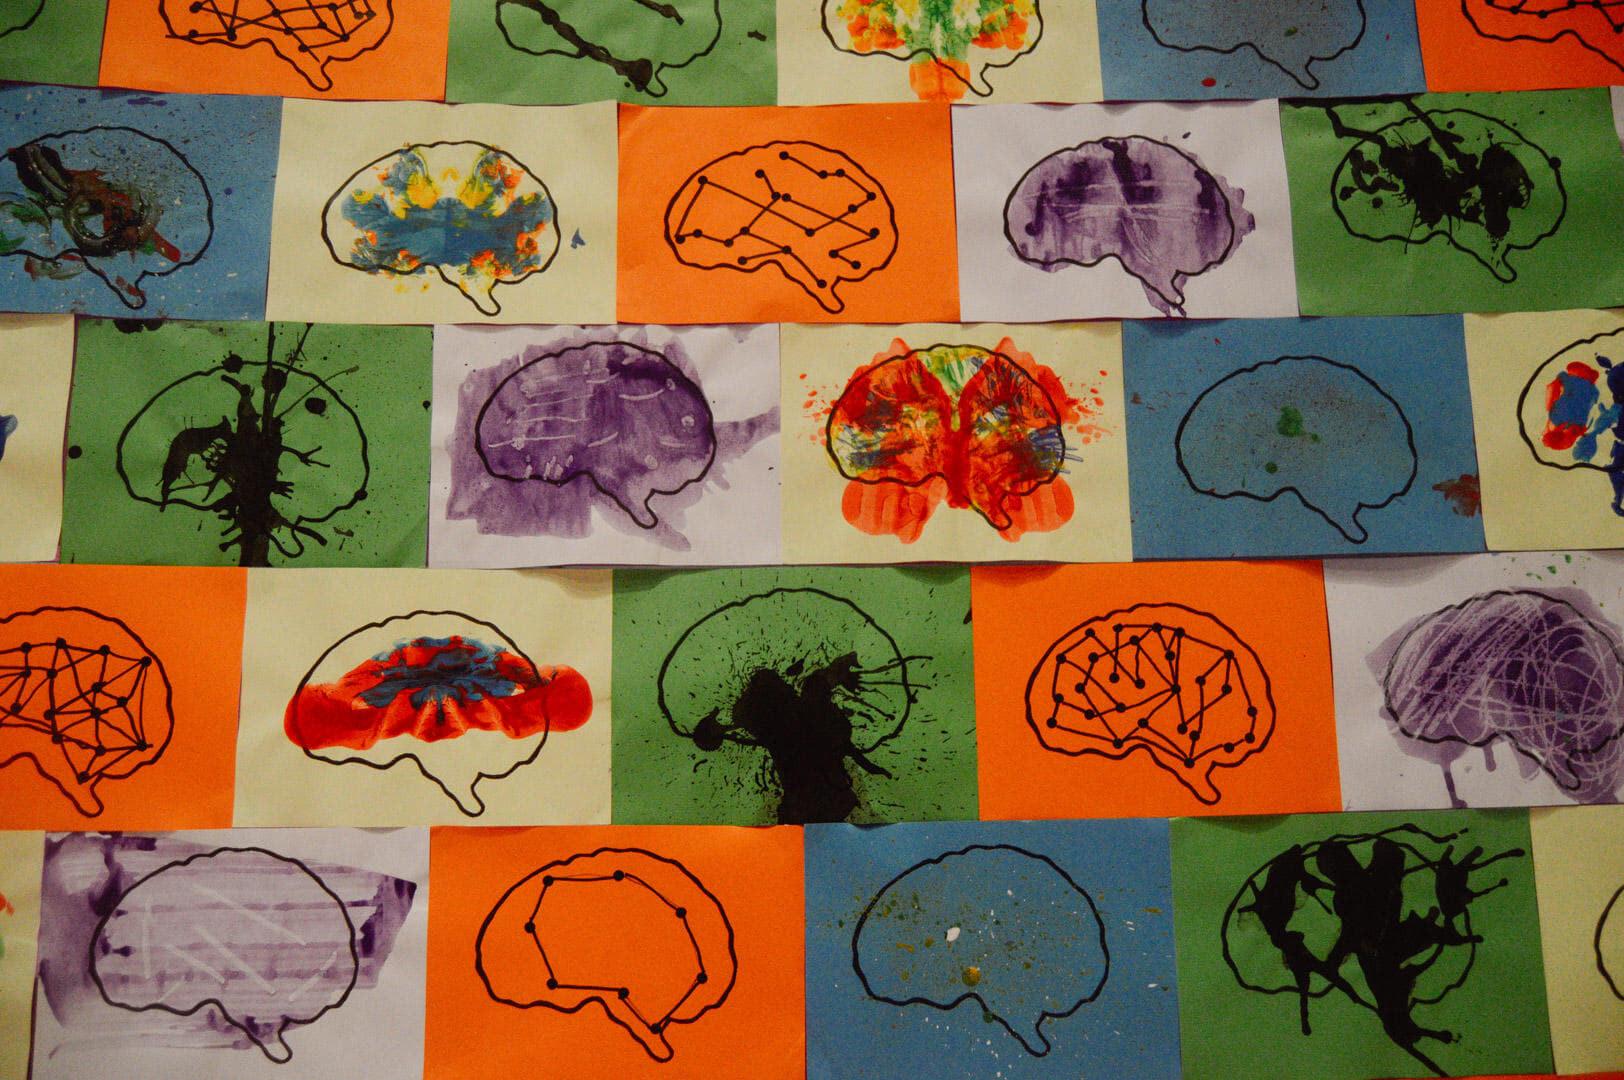 Brain drawings by primary school children